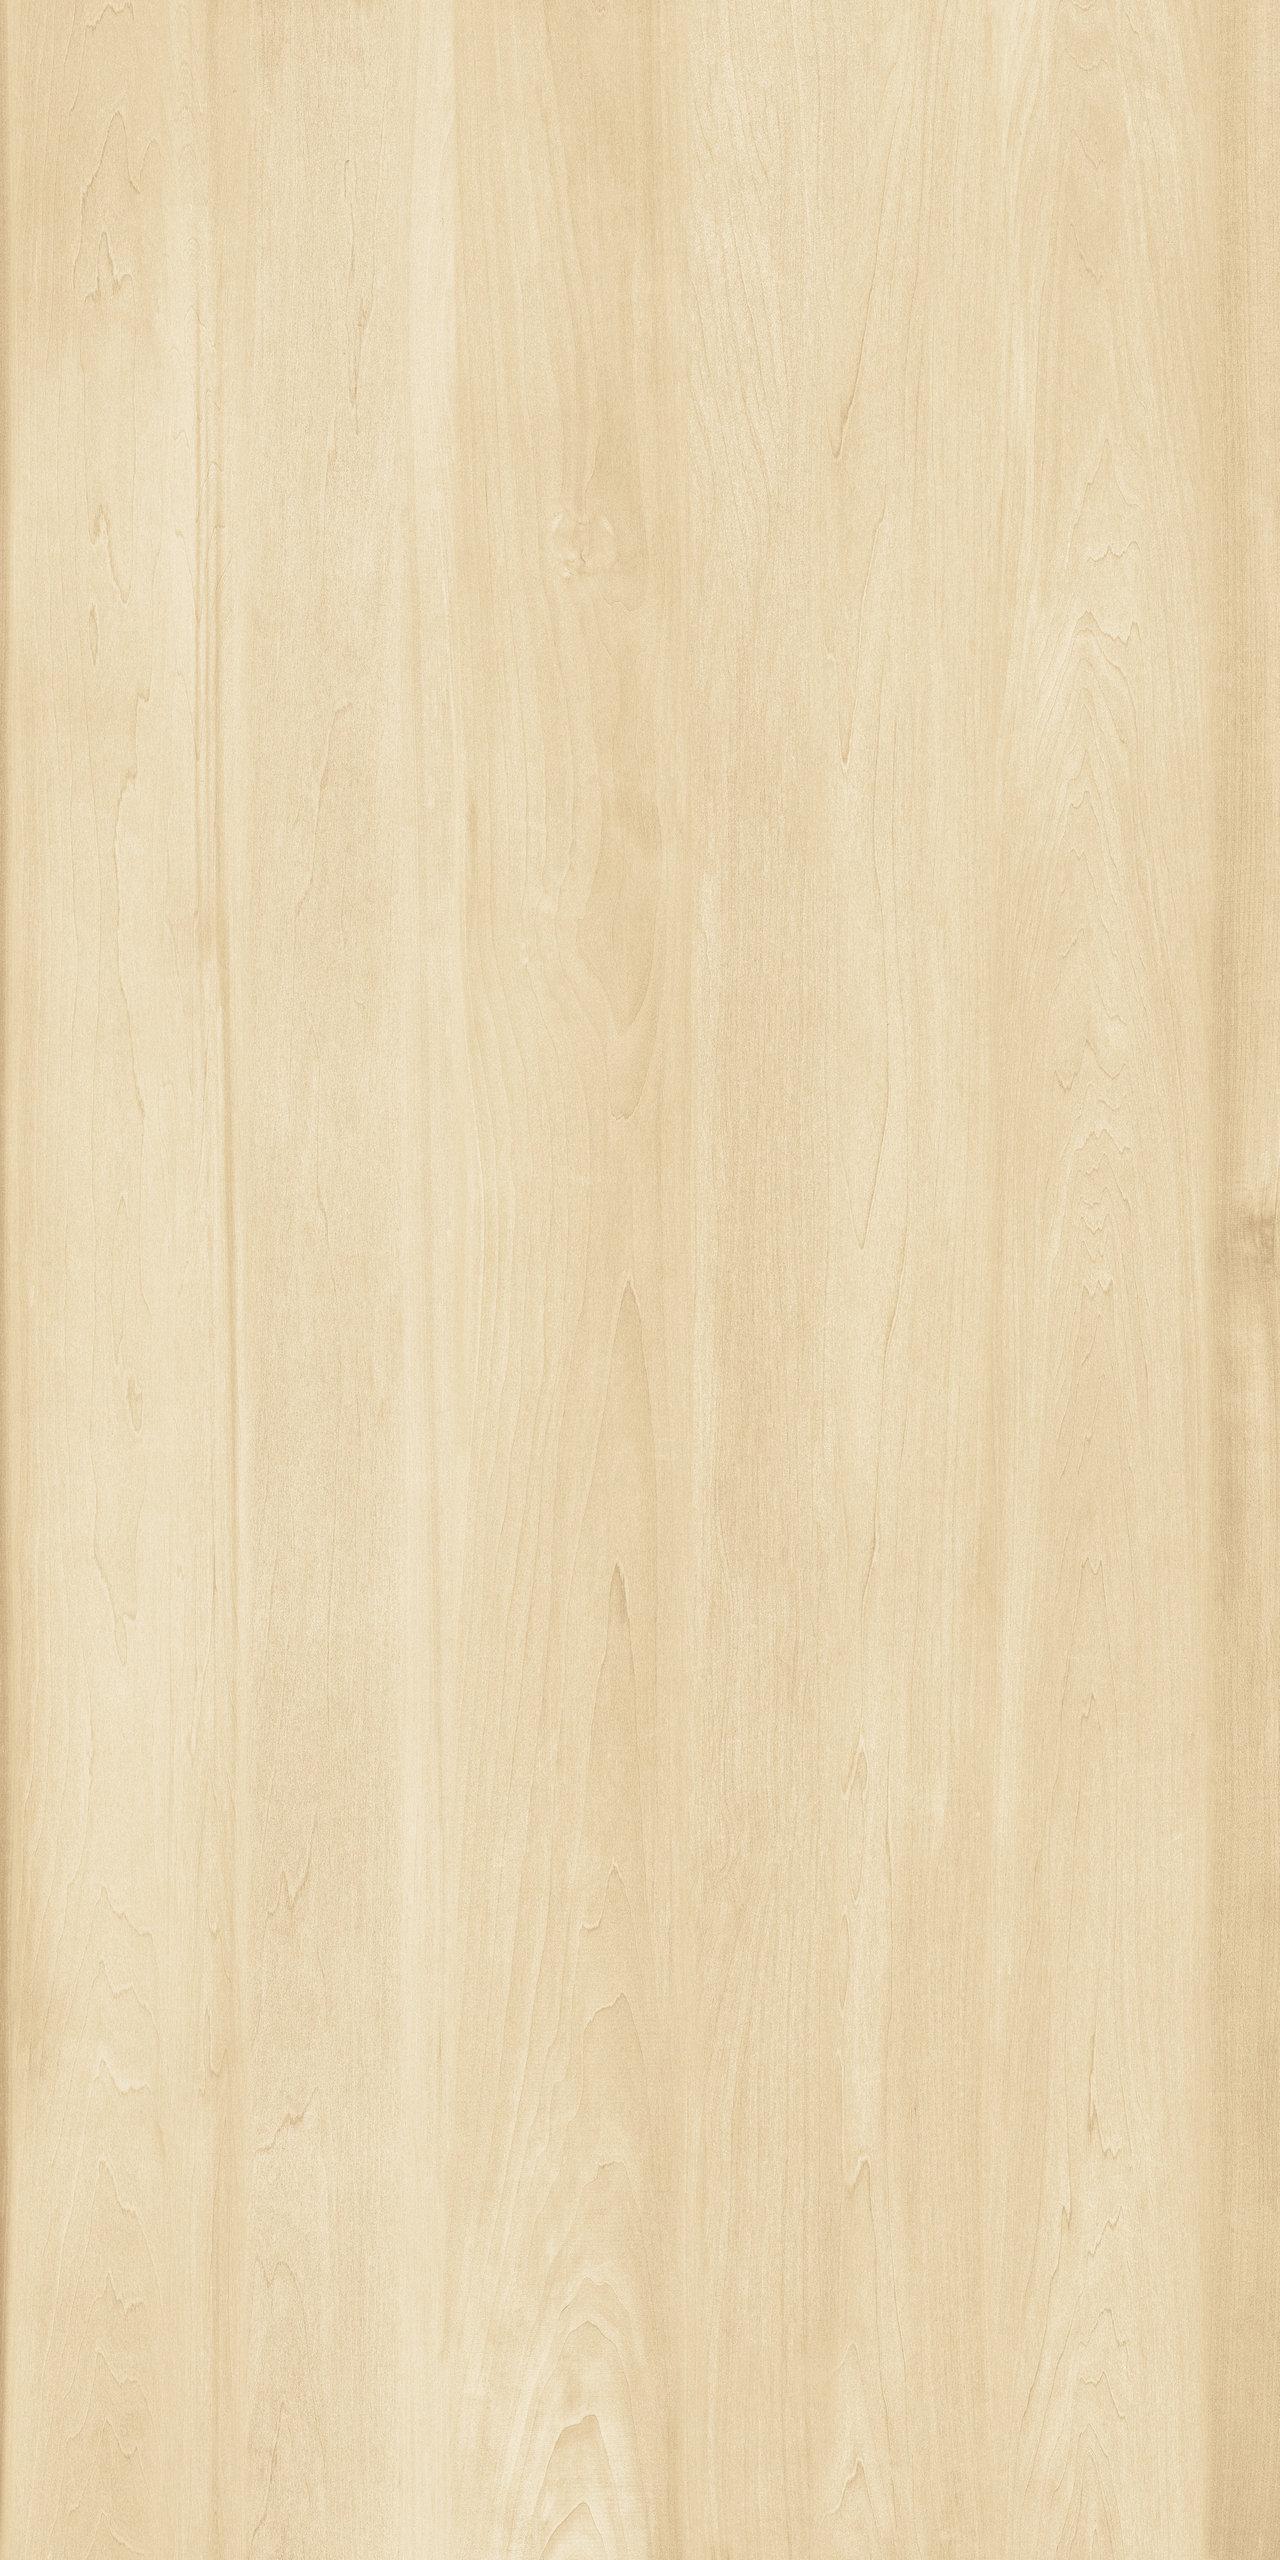 Infinite Wood sp iw wicker nat 4812 f1 USG1248221